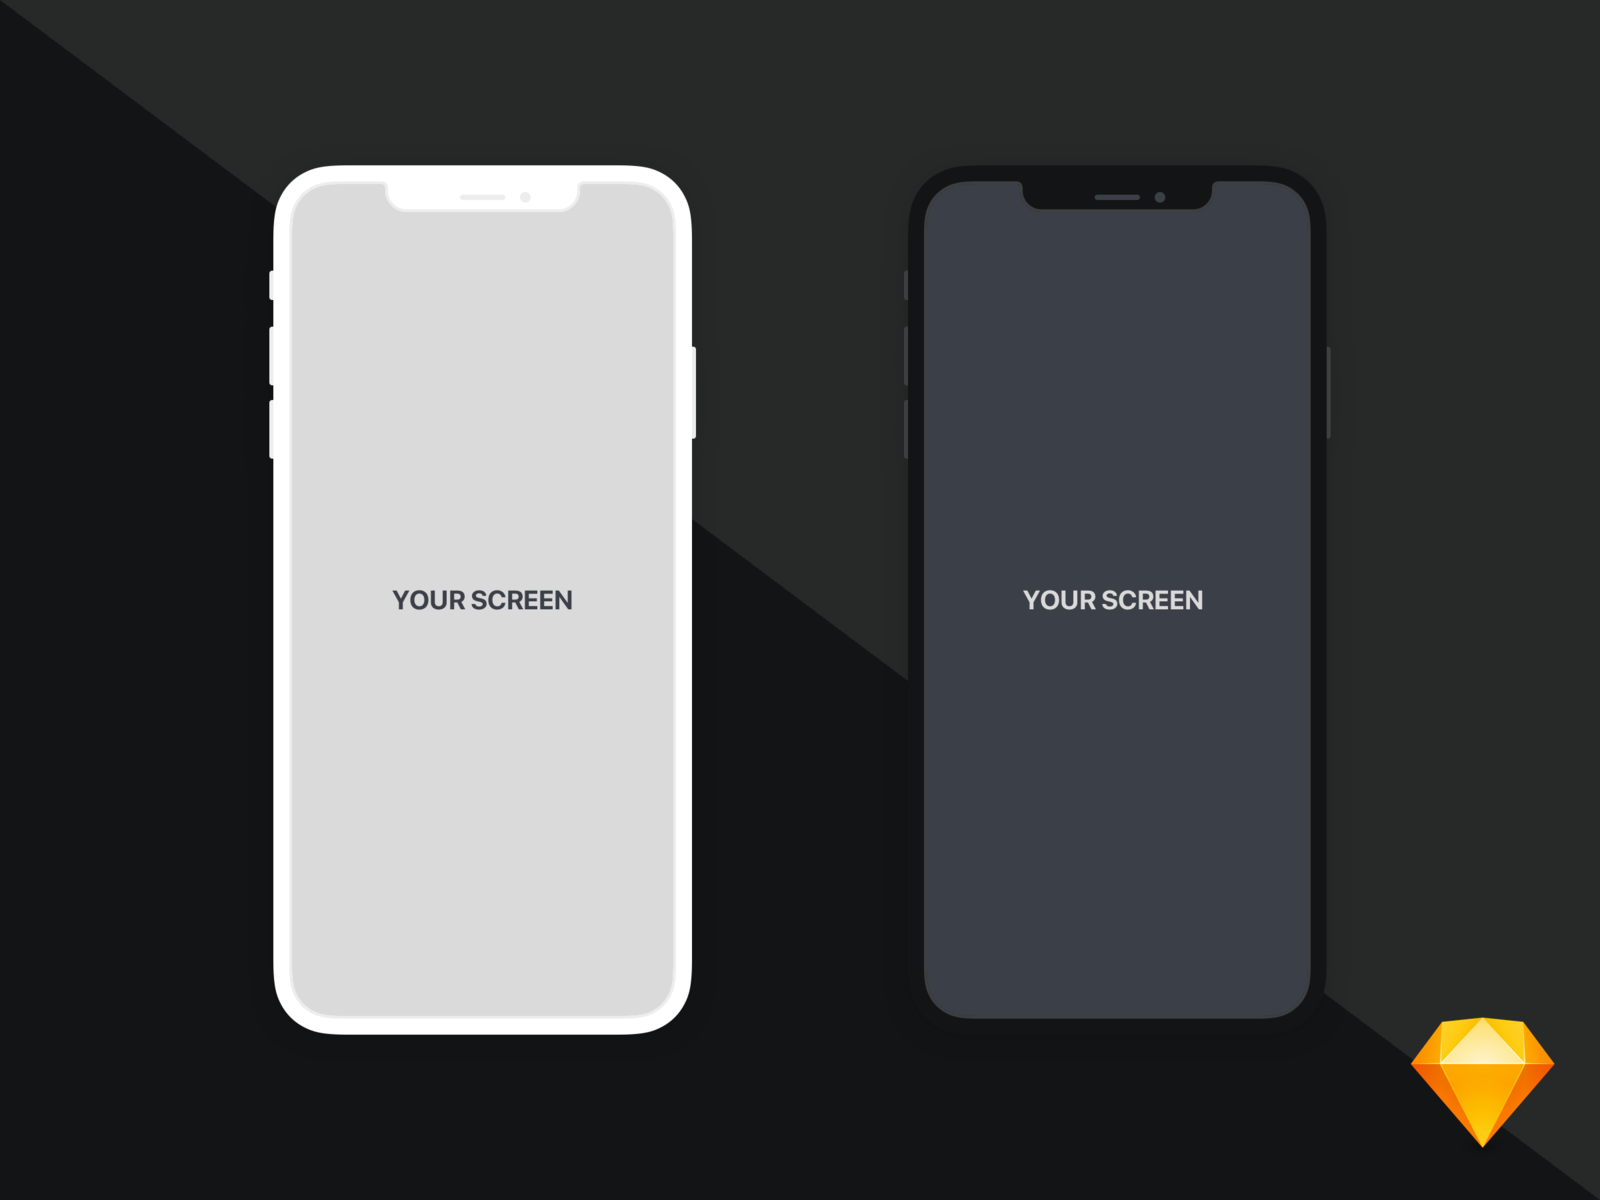 Mobile Phone Replenishing Mobile Desktop Mobile Banking Iphone7 Flat Banking Smartphone Apple Iphone10 Iphonex Iphone A Iphone Mockup Iphone Mockup Free Iphone